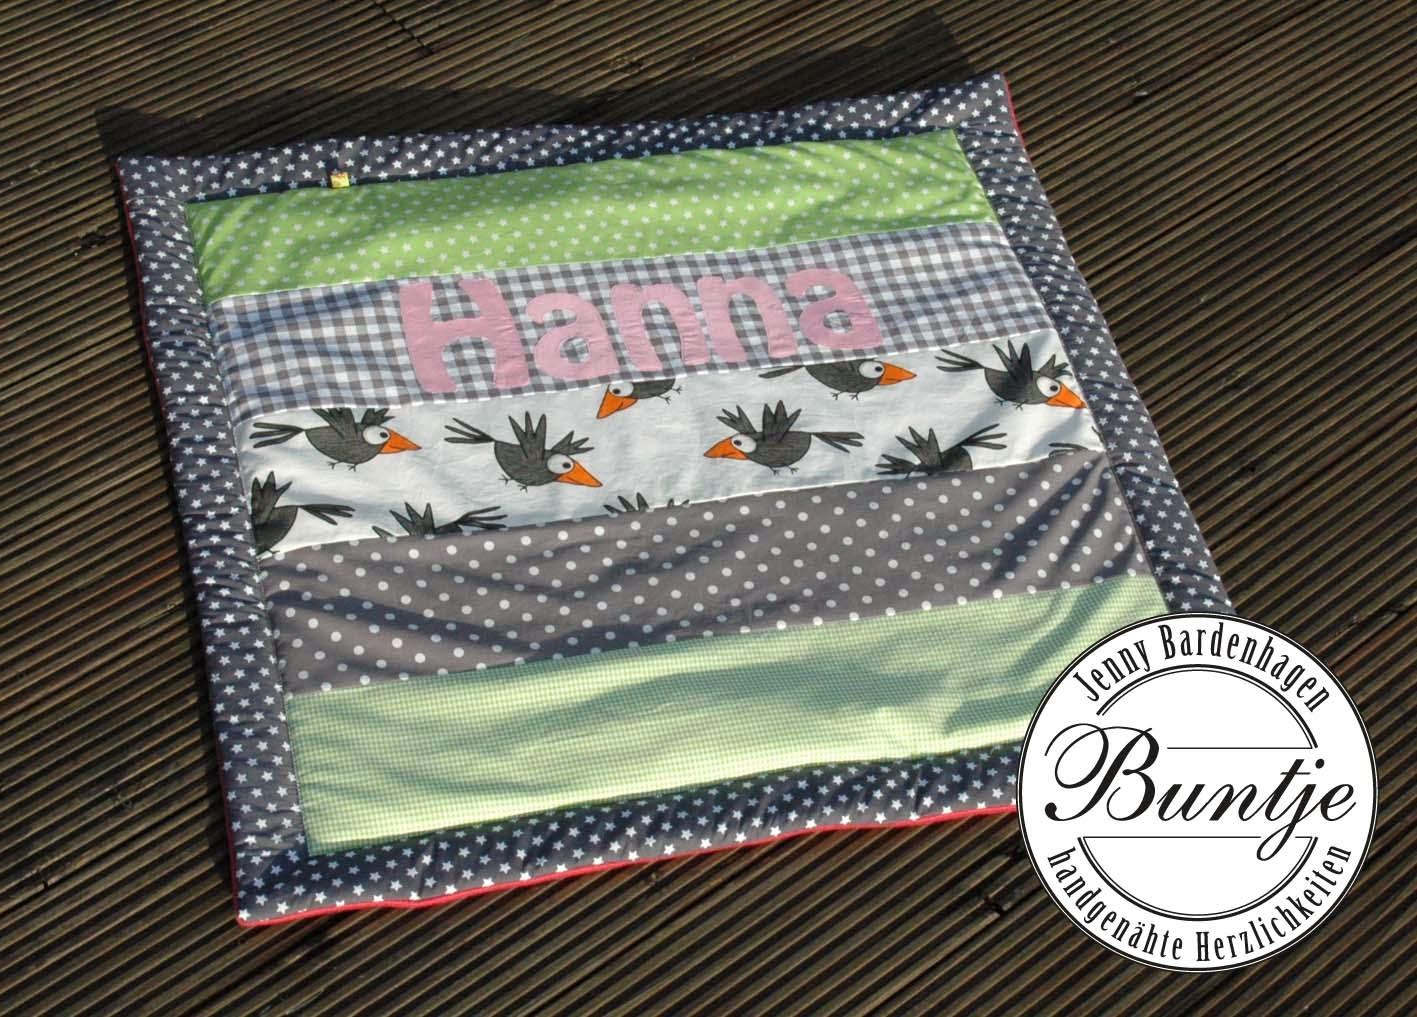 Krabbeldecke Decke Baby Mädchen Name Geschenk Geburt Taufe rosa grün grau Raben Vögel Tiere handmade Buntje Nähen